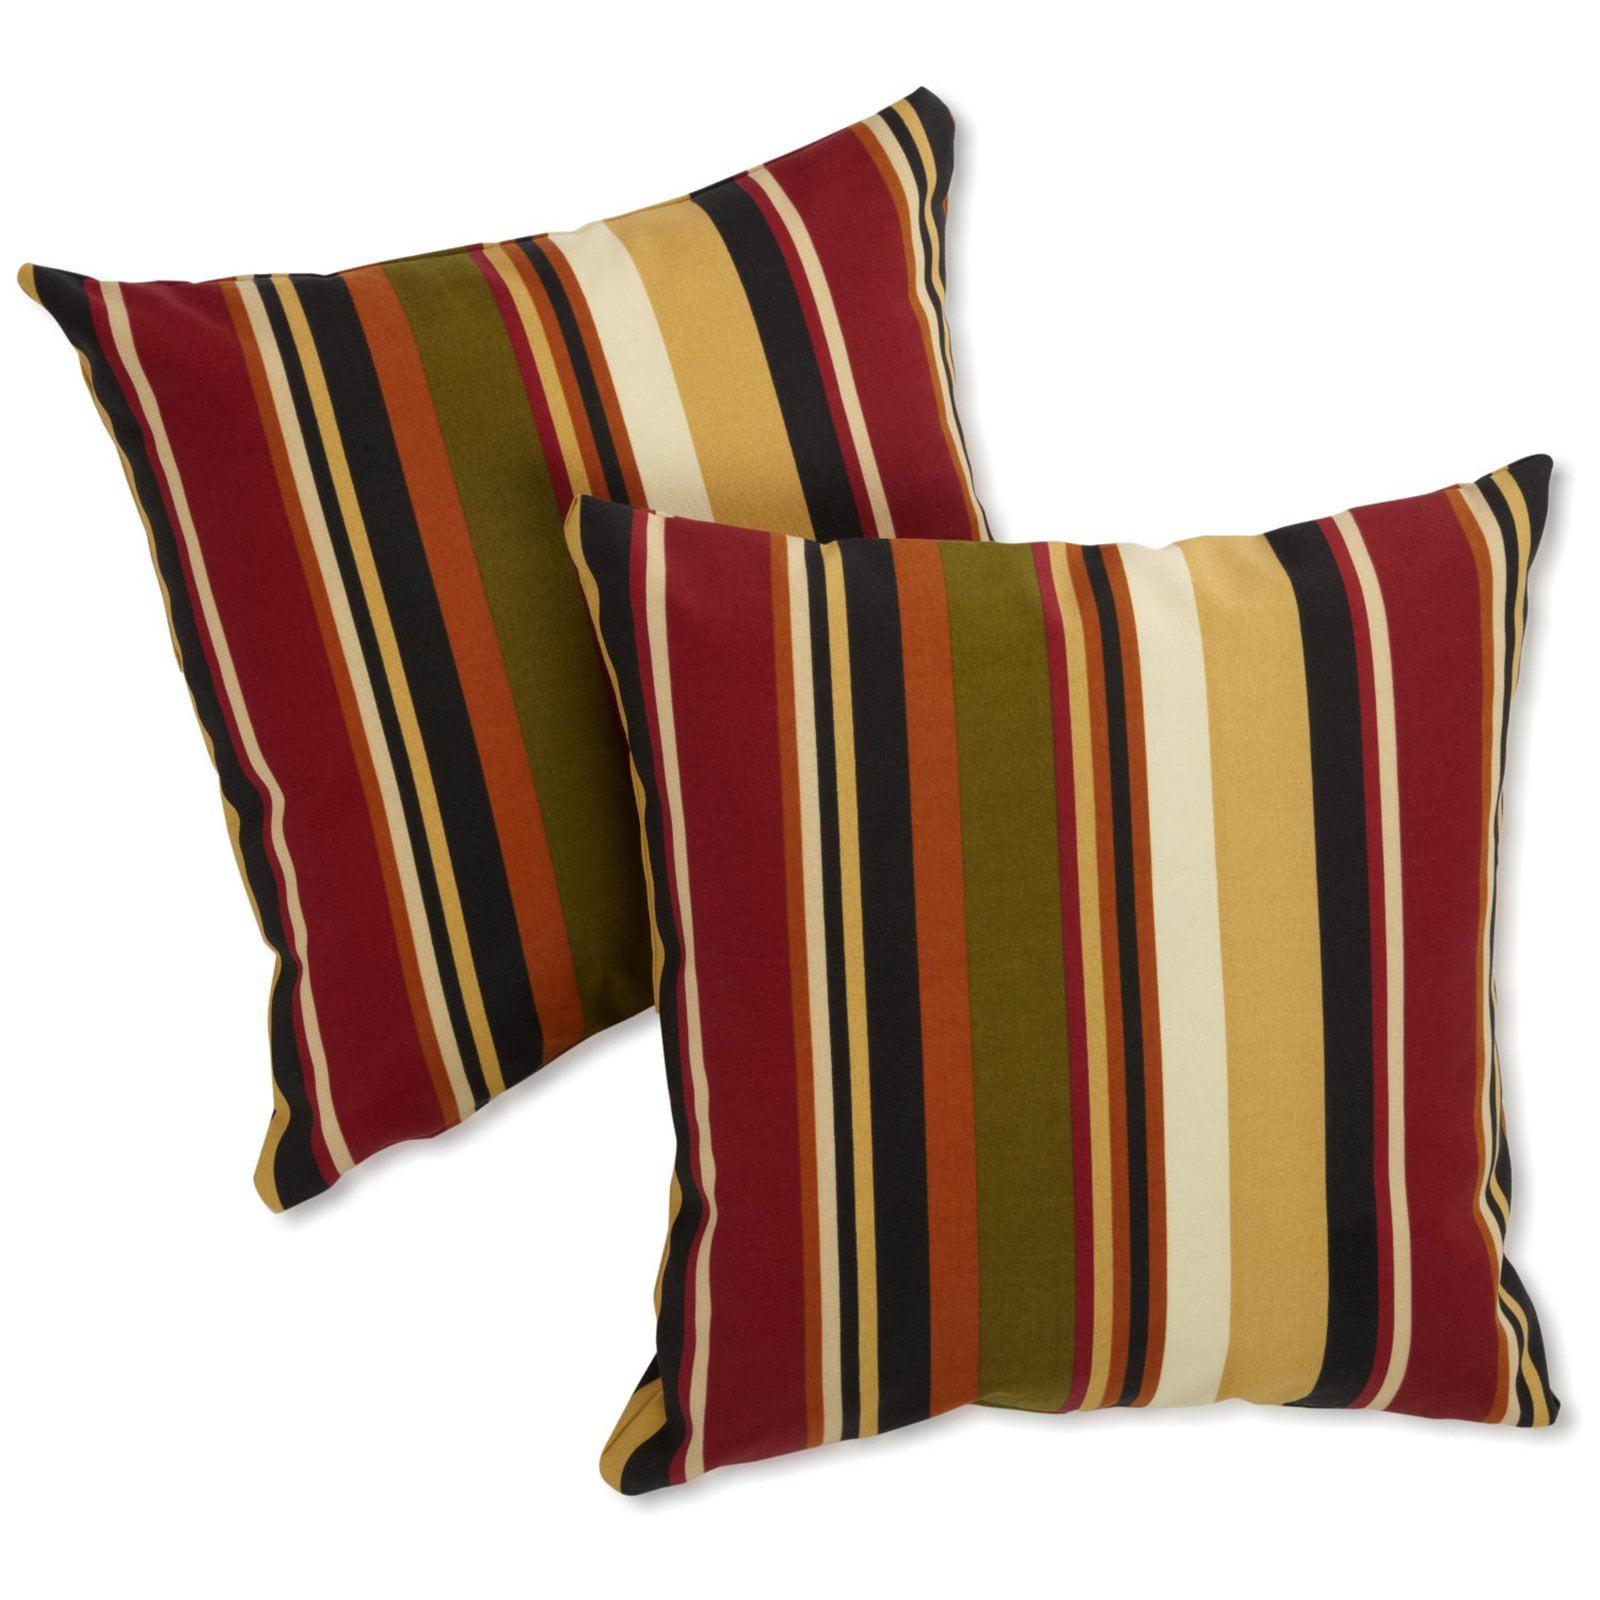 Blazing Needles 25 x 25 in. Jumbo Outdoor Throw Pillows - Set of 2